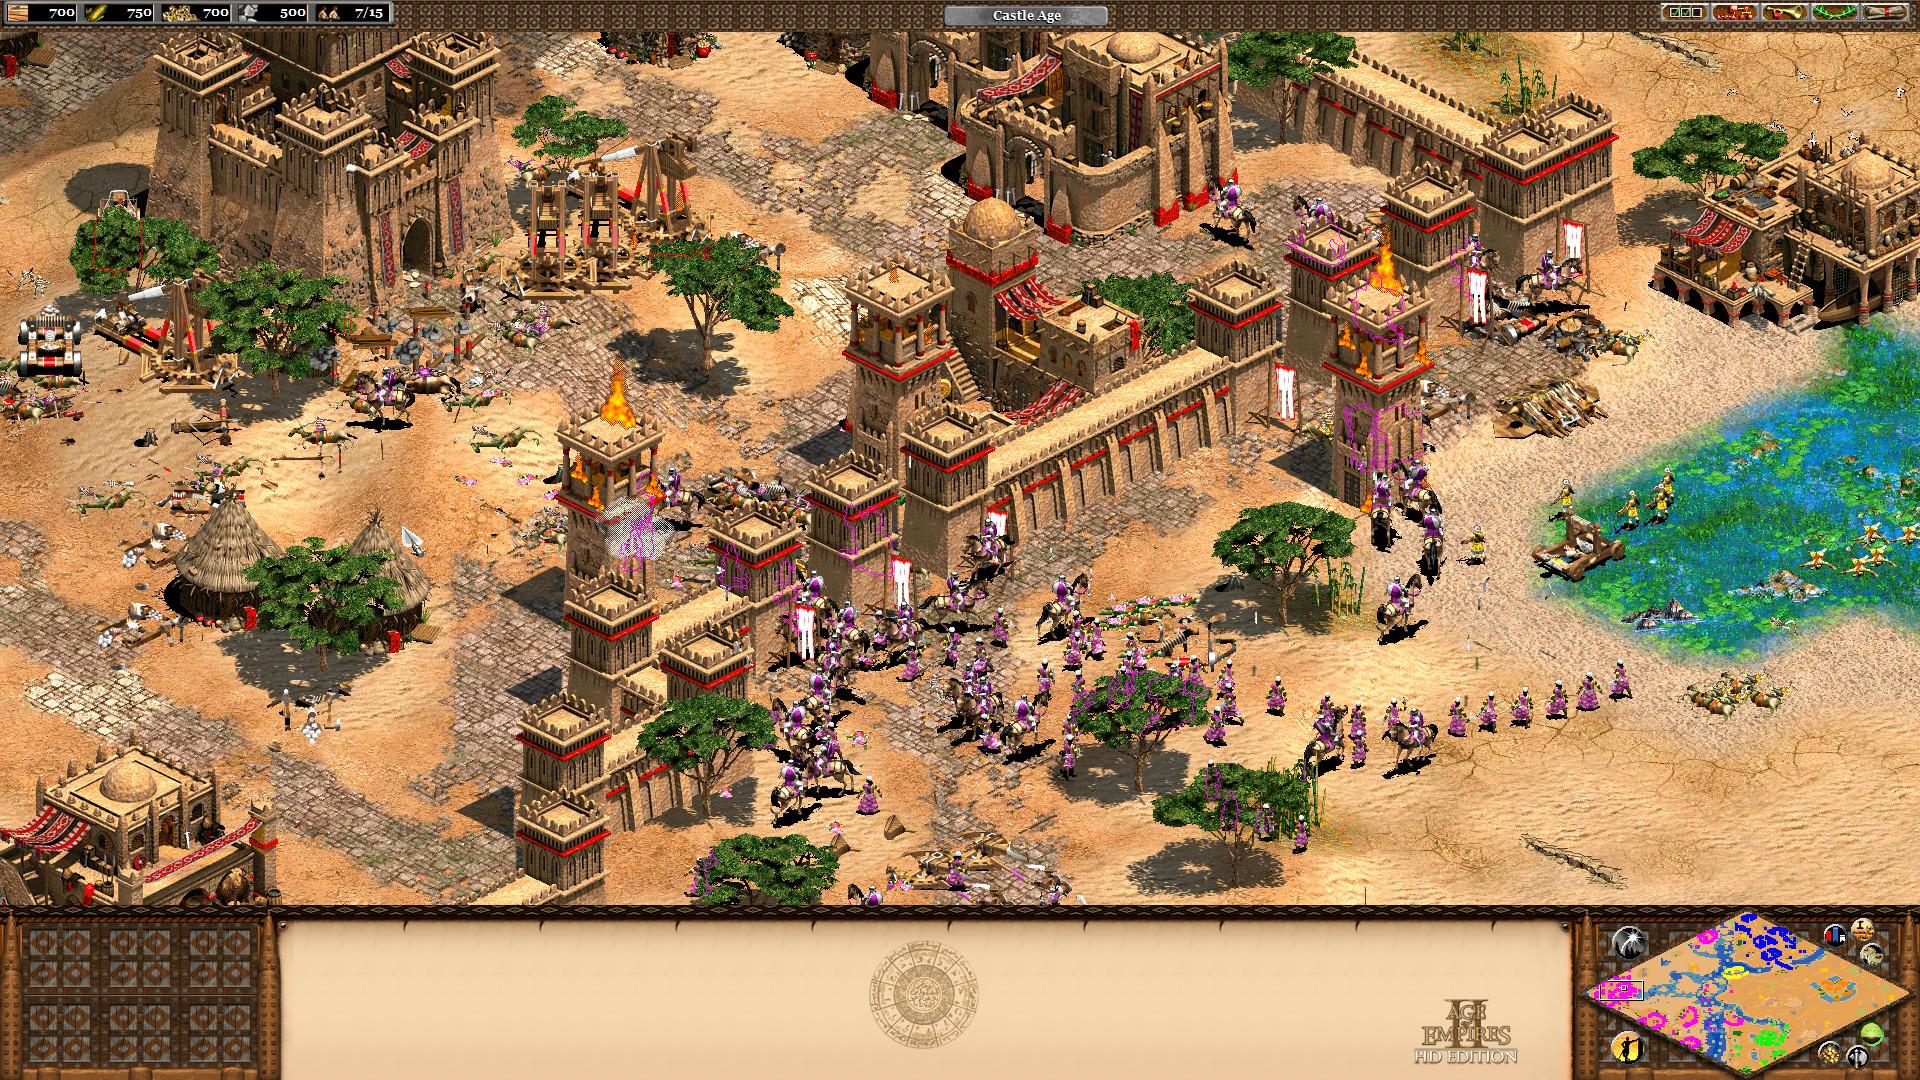 age of empires 4 download utorrent